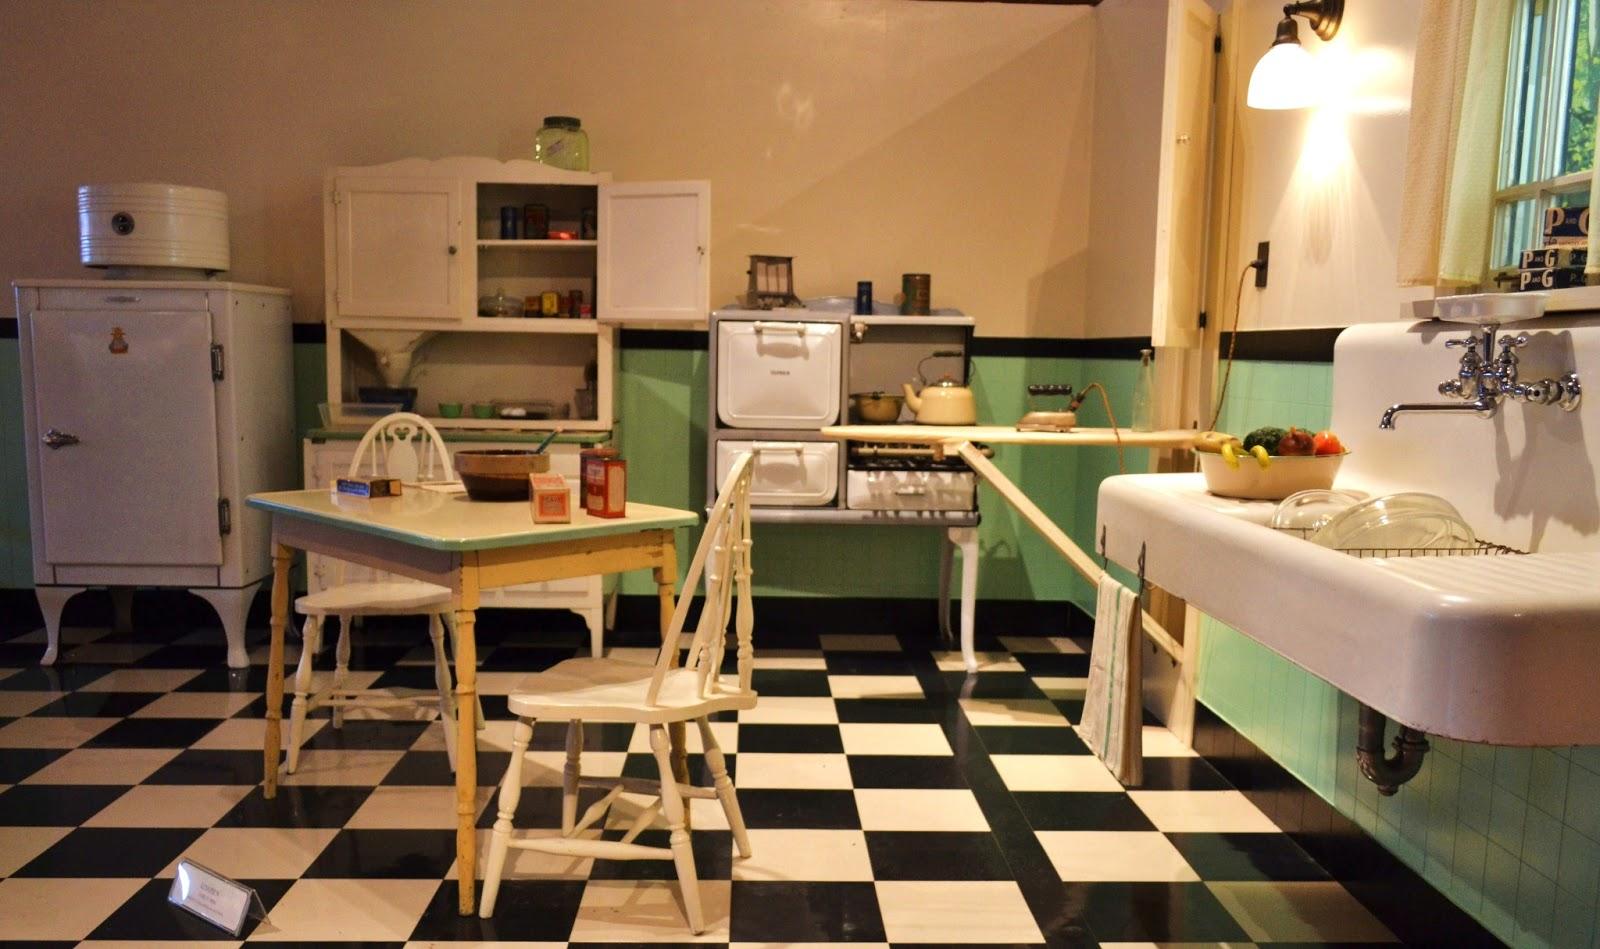 1930s kitchen kitchen fun pinterest 1930s kitchen for 1930 s kitchen cabinets